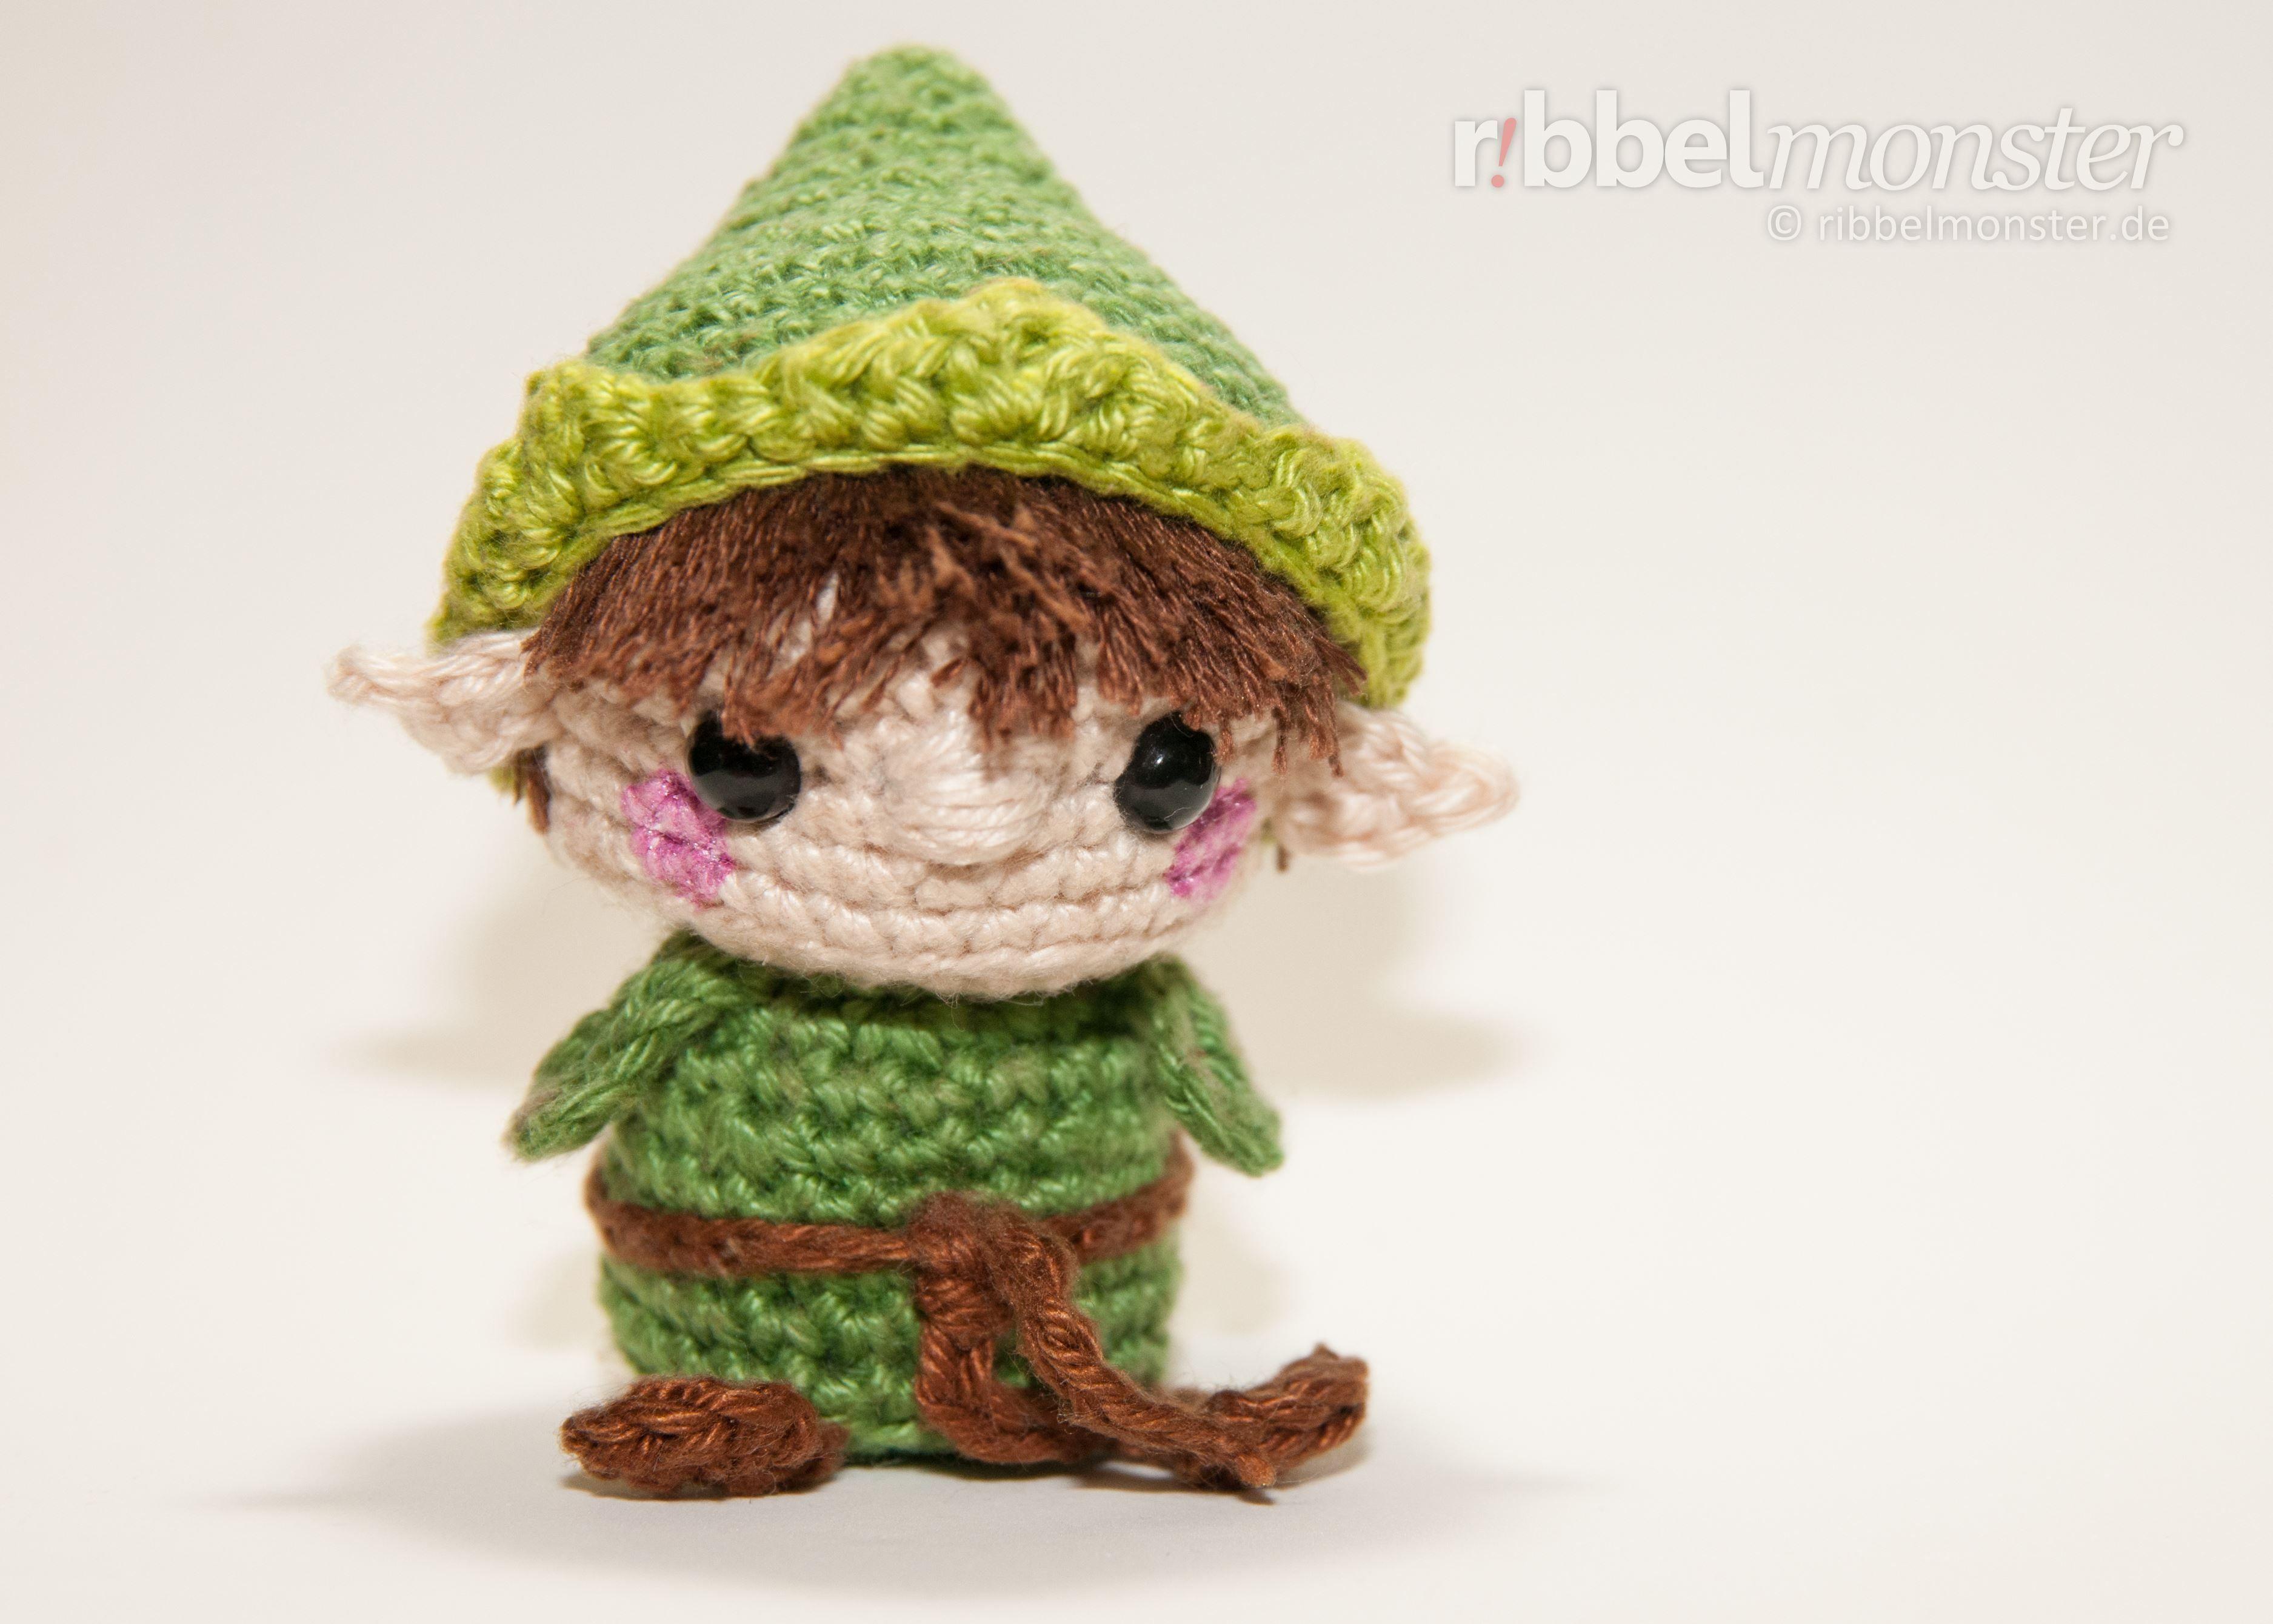 Amigurumi Minimee Elf Häkeln Tinsel Gratis Anleitung Crochet